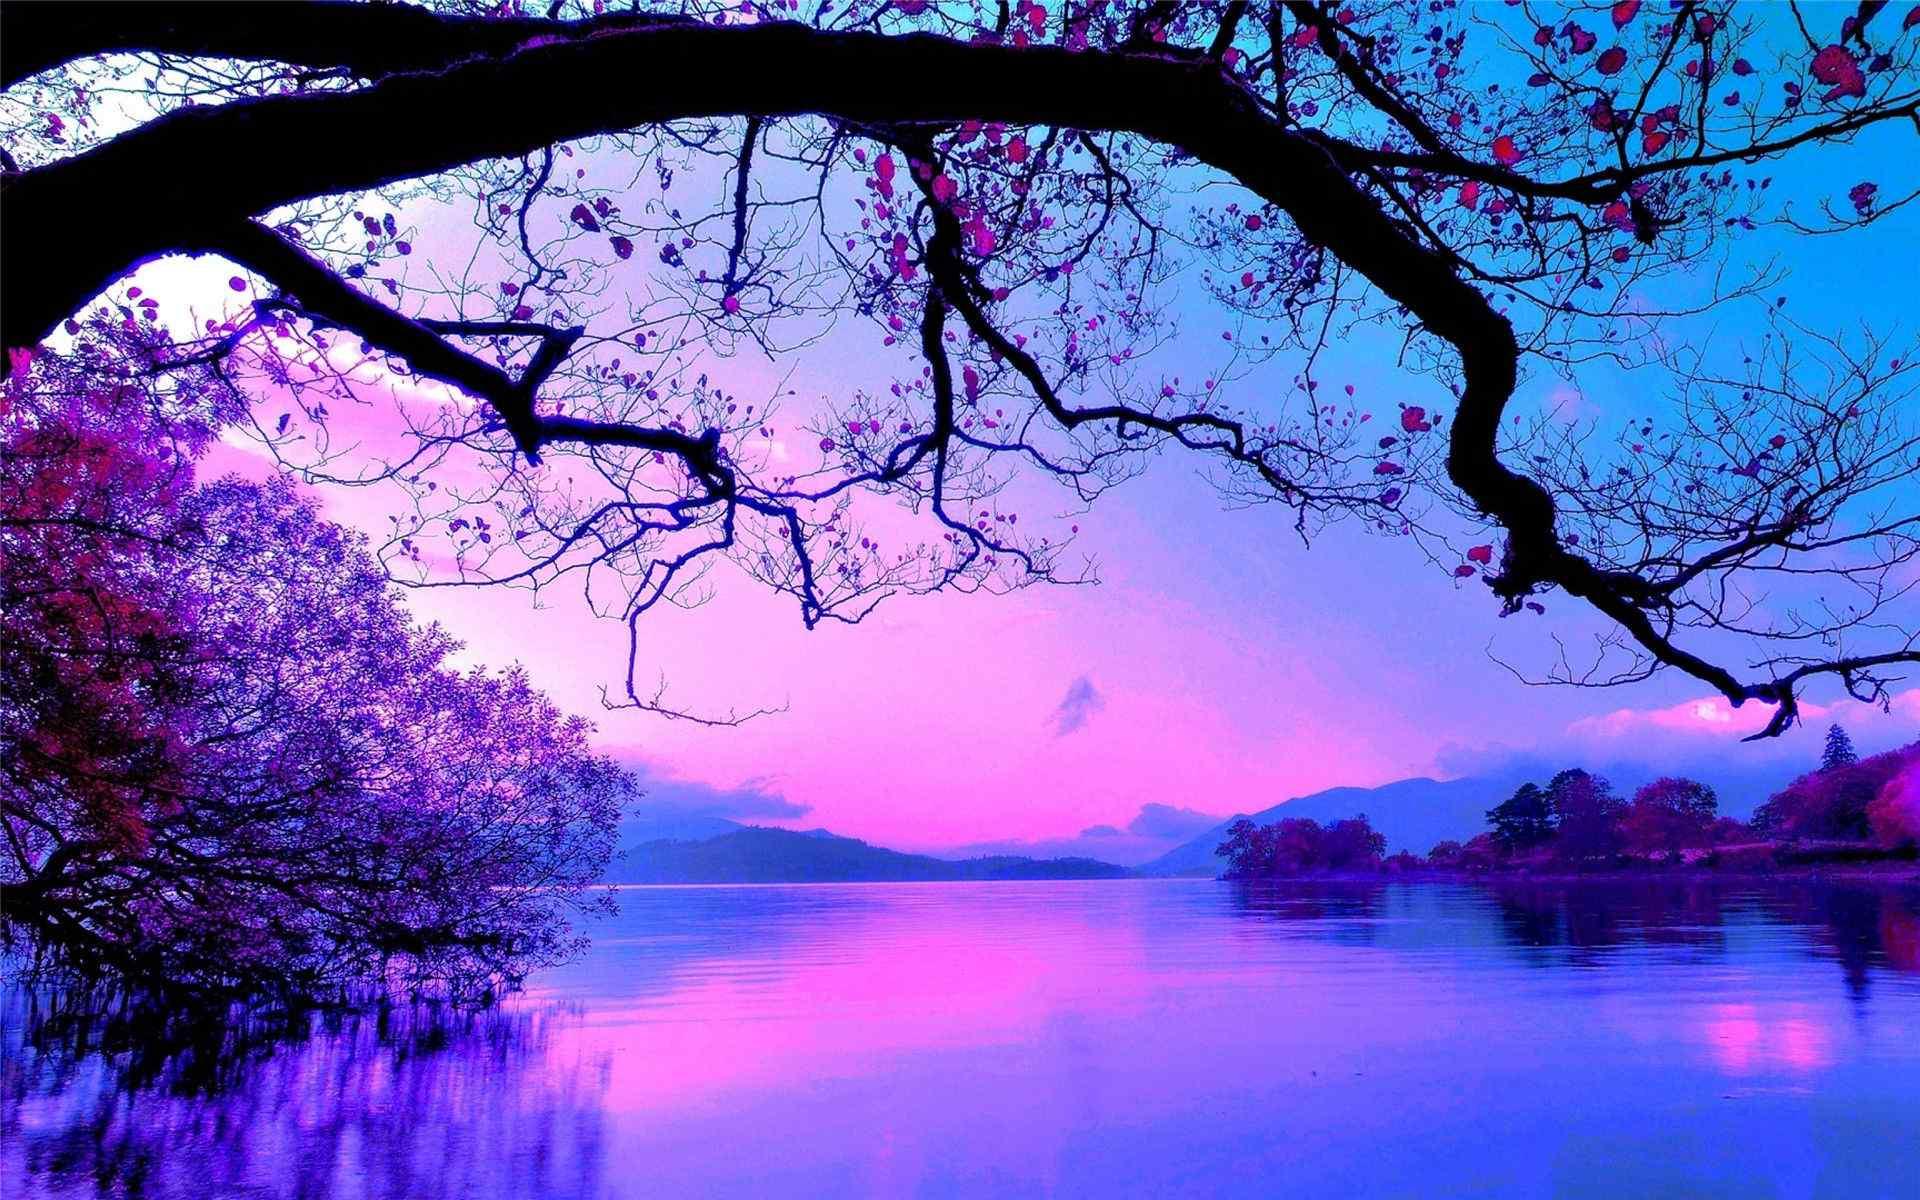 紫色梦幻素材唯美桌面壁纸 桌面天下 Desktx Com Most Beautiful Background Color Image